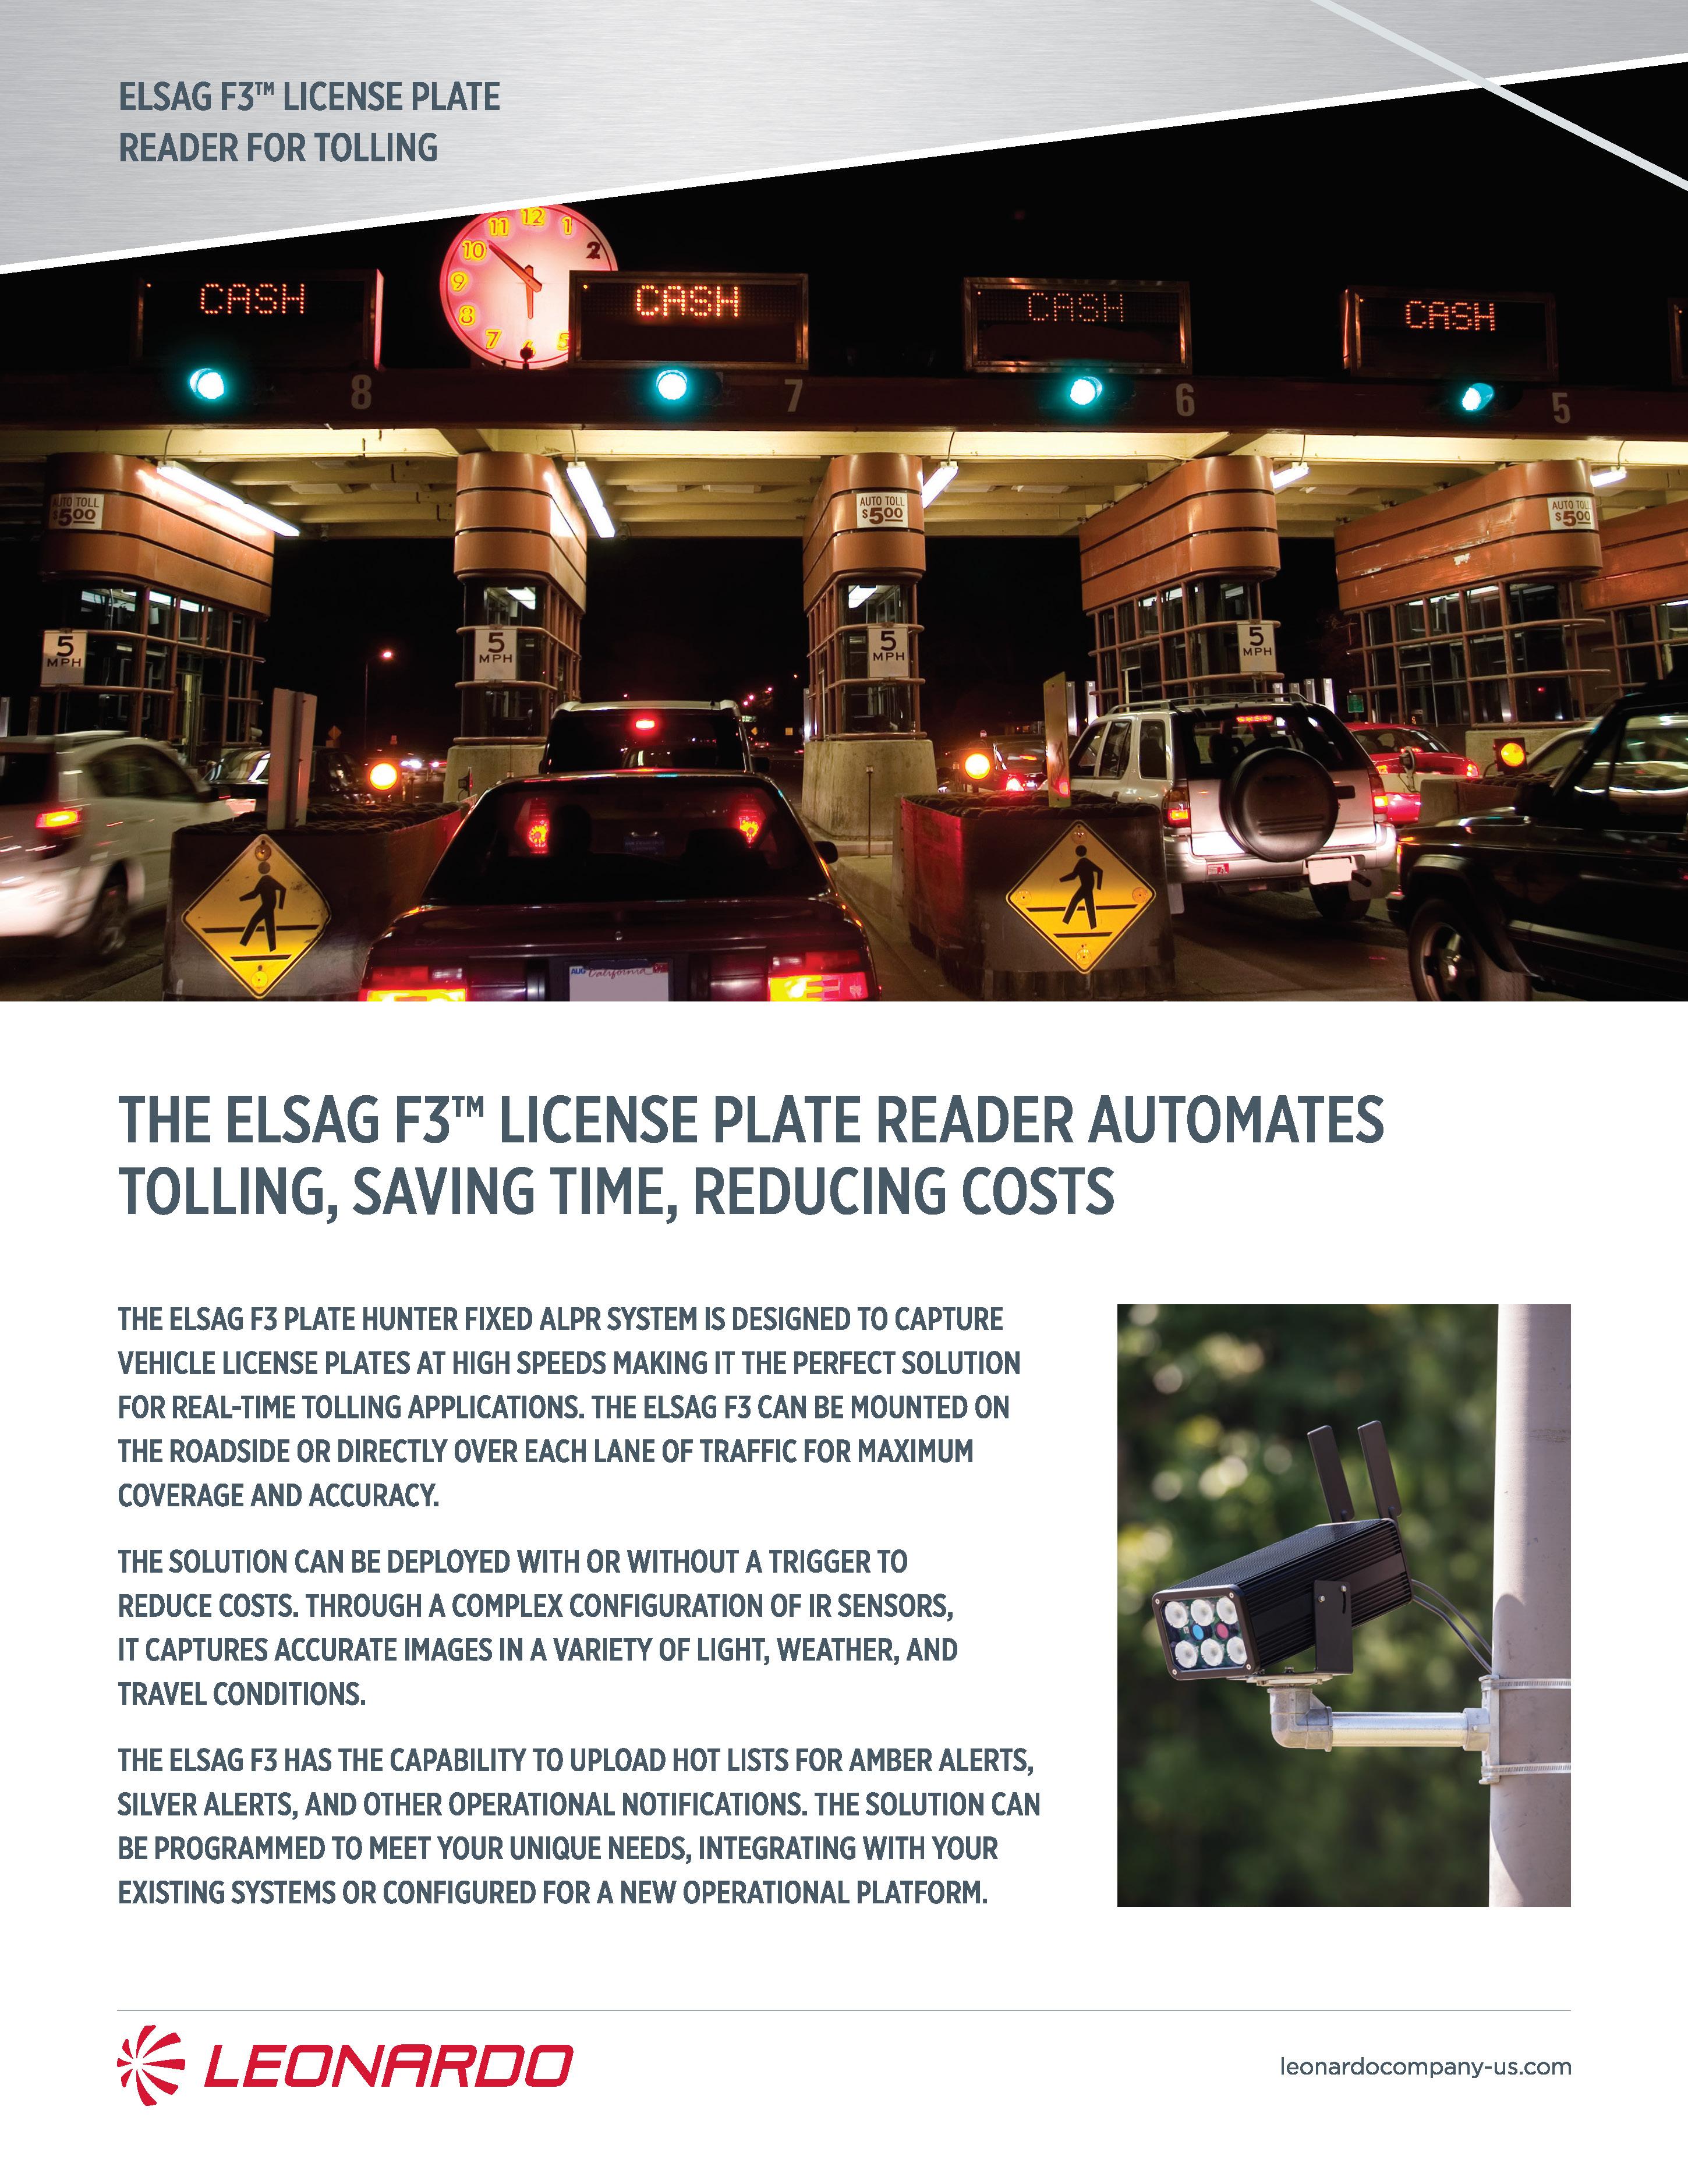 ELSAG plate hunter for tolling product sheet